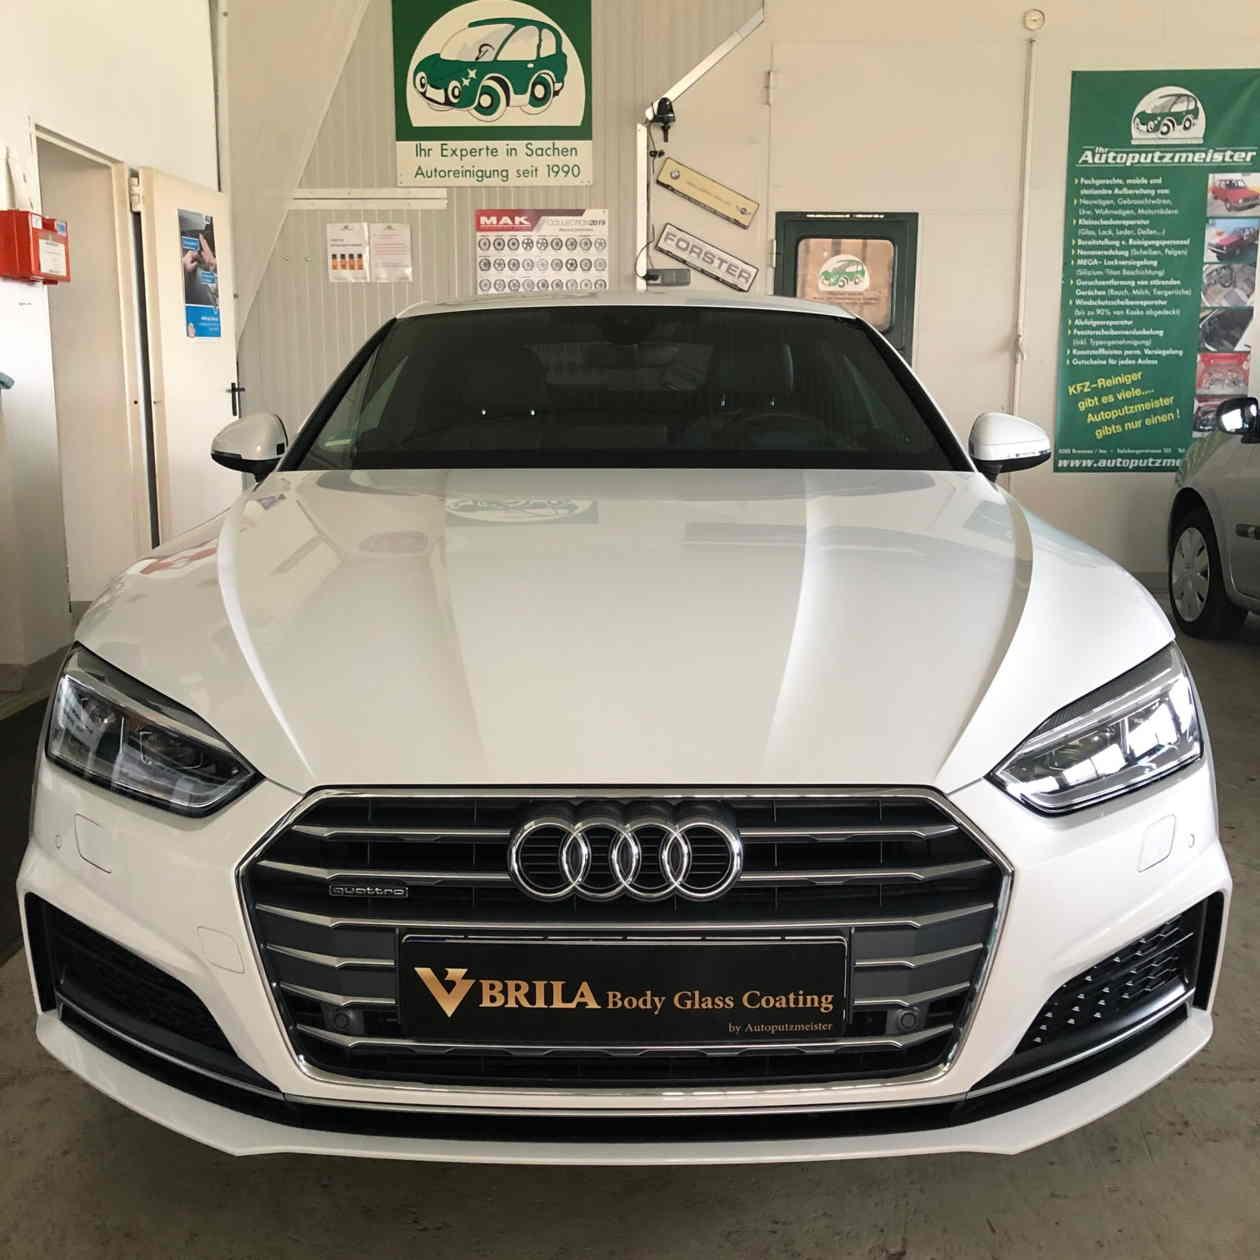 BRILA Braunau Redline Body Coating Audi A5 Front